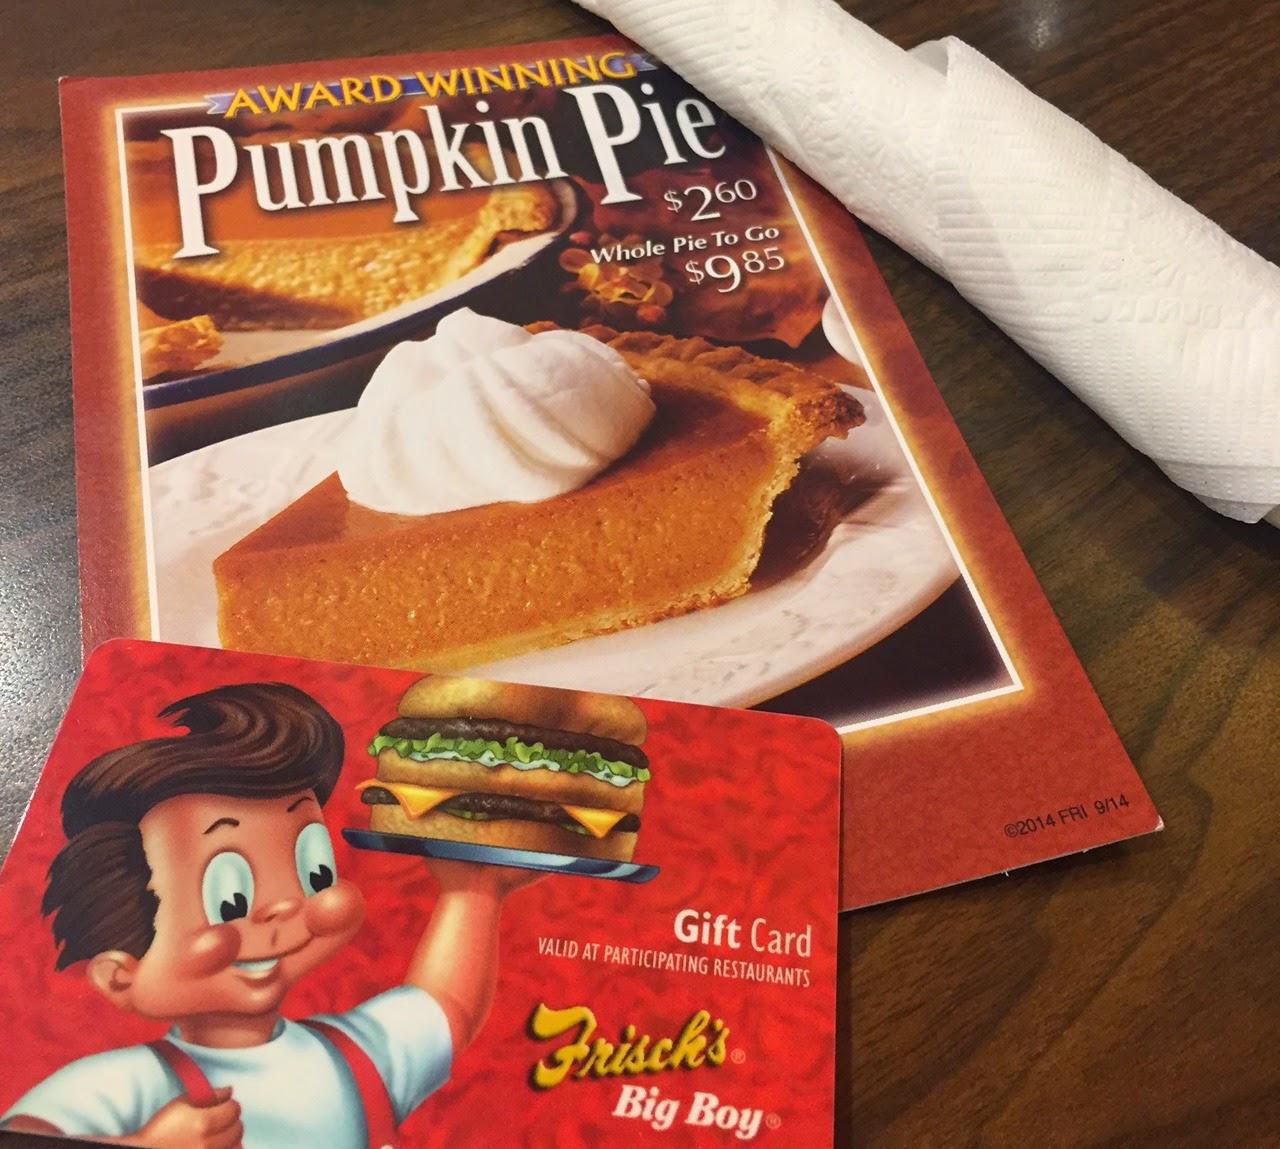 Nominate Someone For A Frisch's Pumpkin Pie Today!